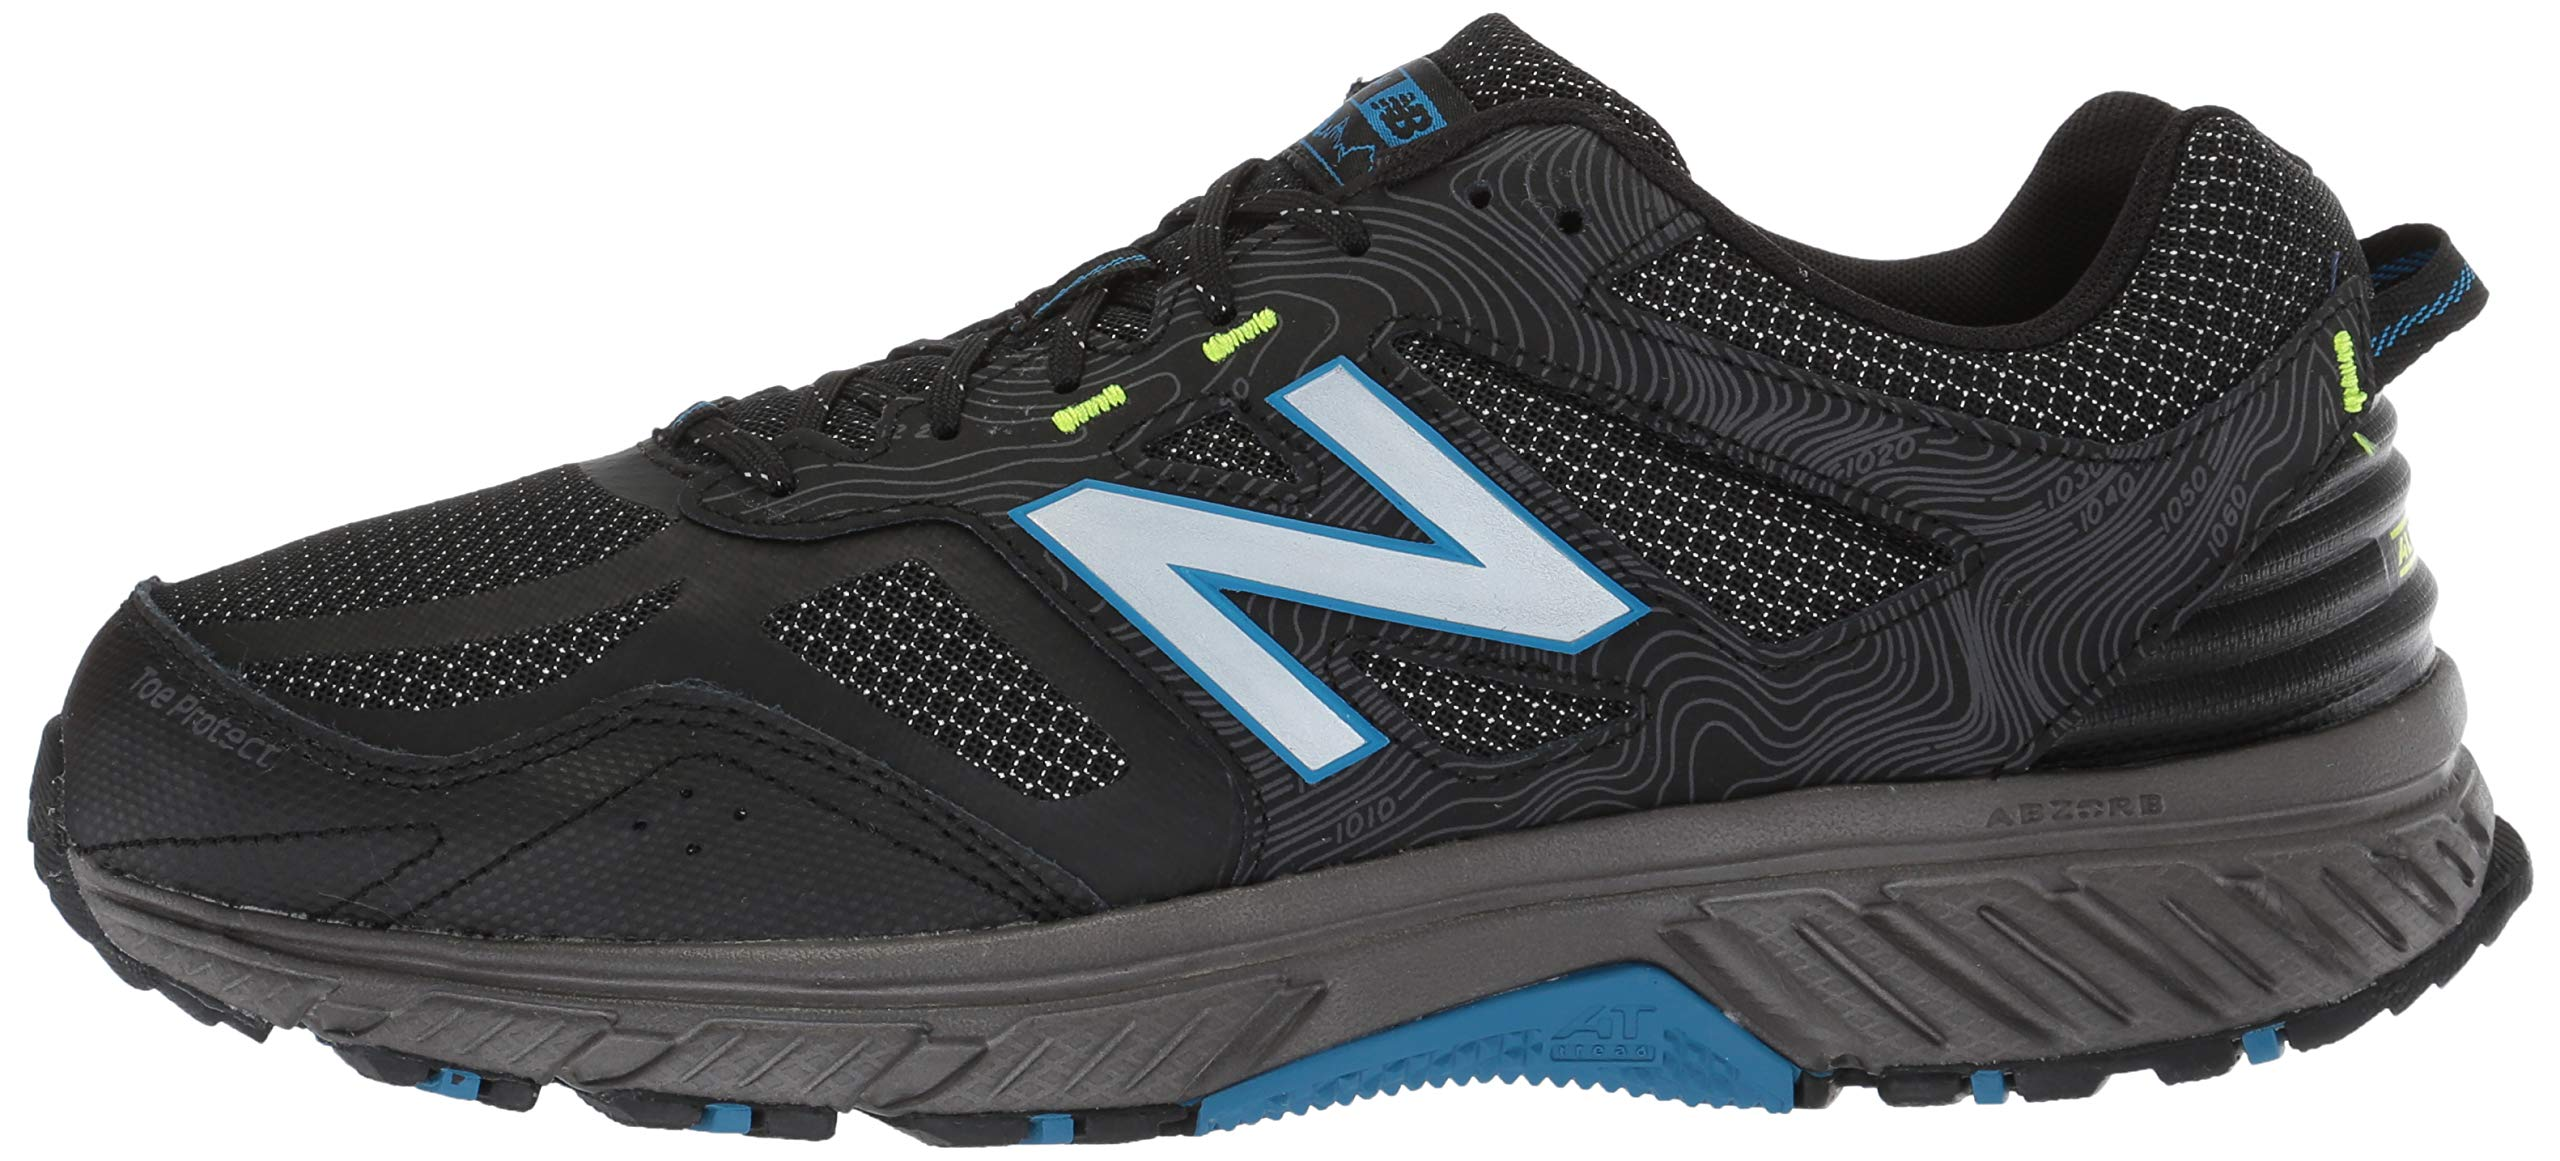 New Balance Men's 510v4 Cushioning Trail Running Shoe, Magnet/Black/Reflective, 7.5 D US by New Balance (Image #5)